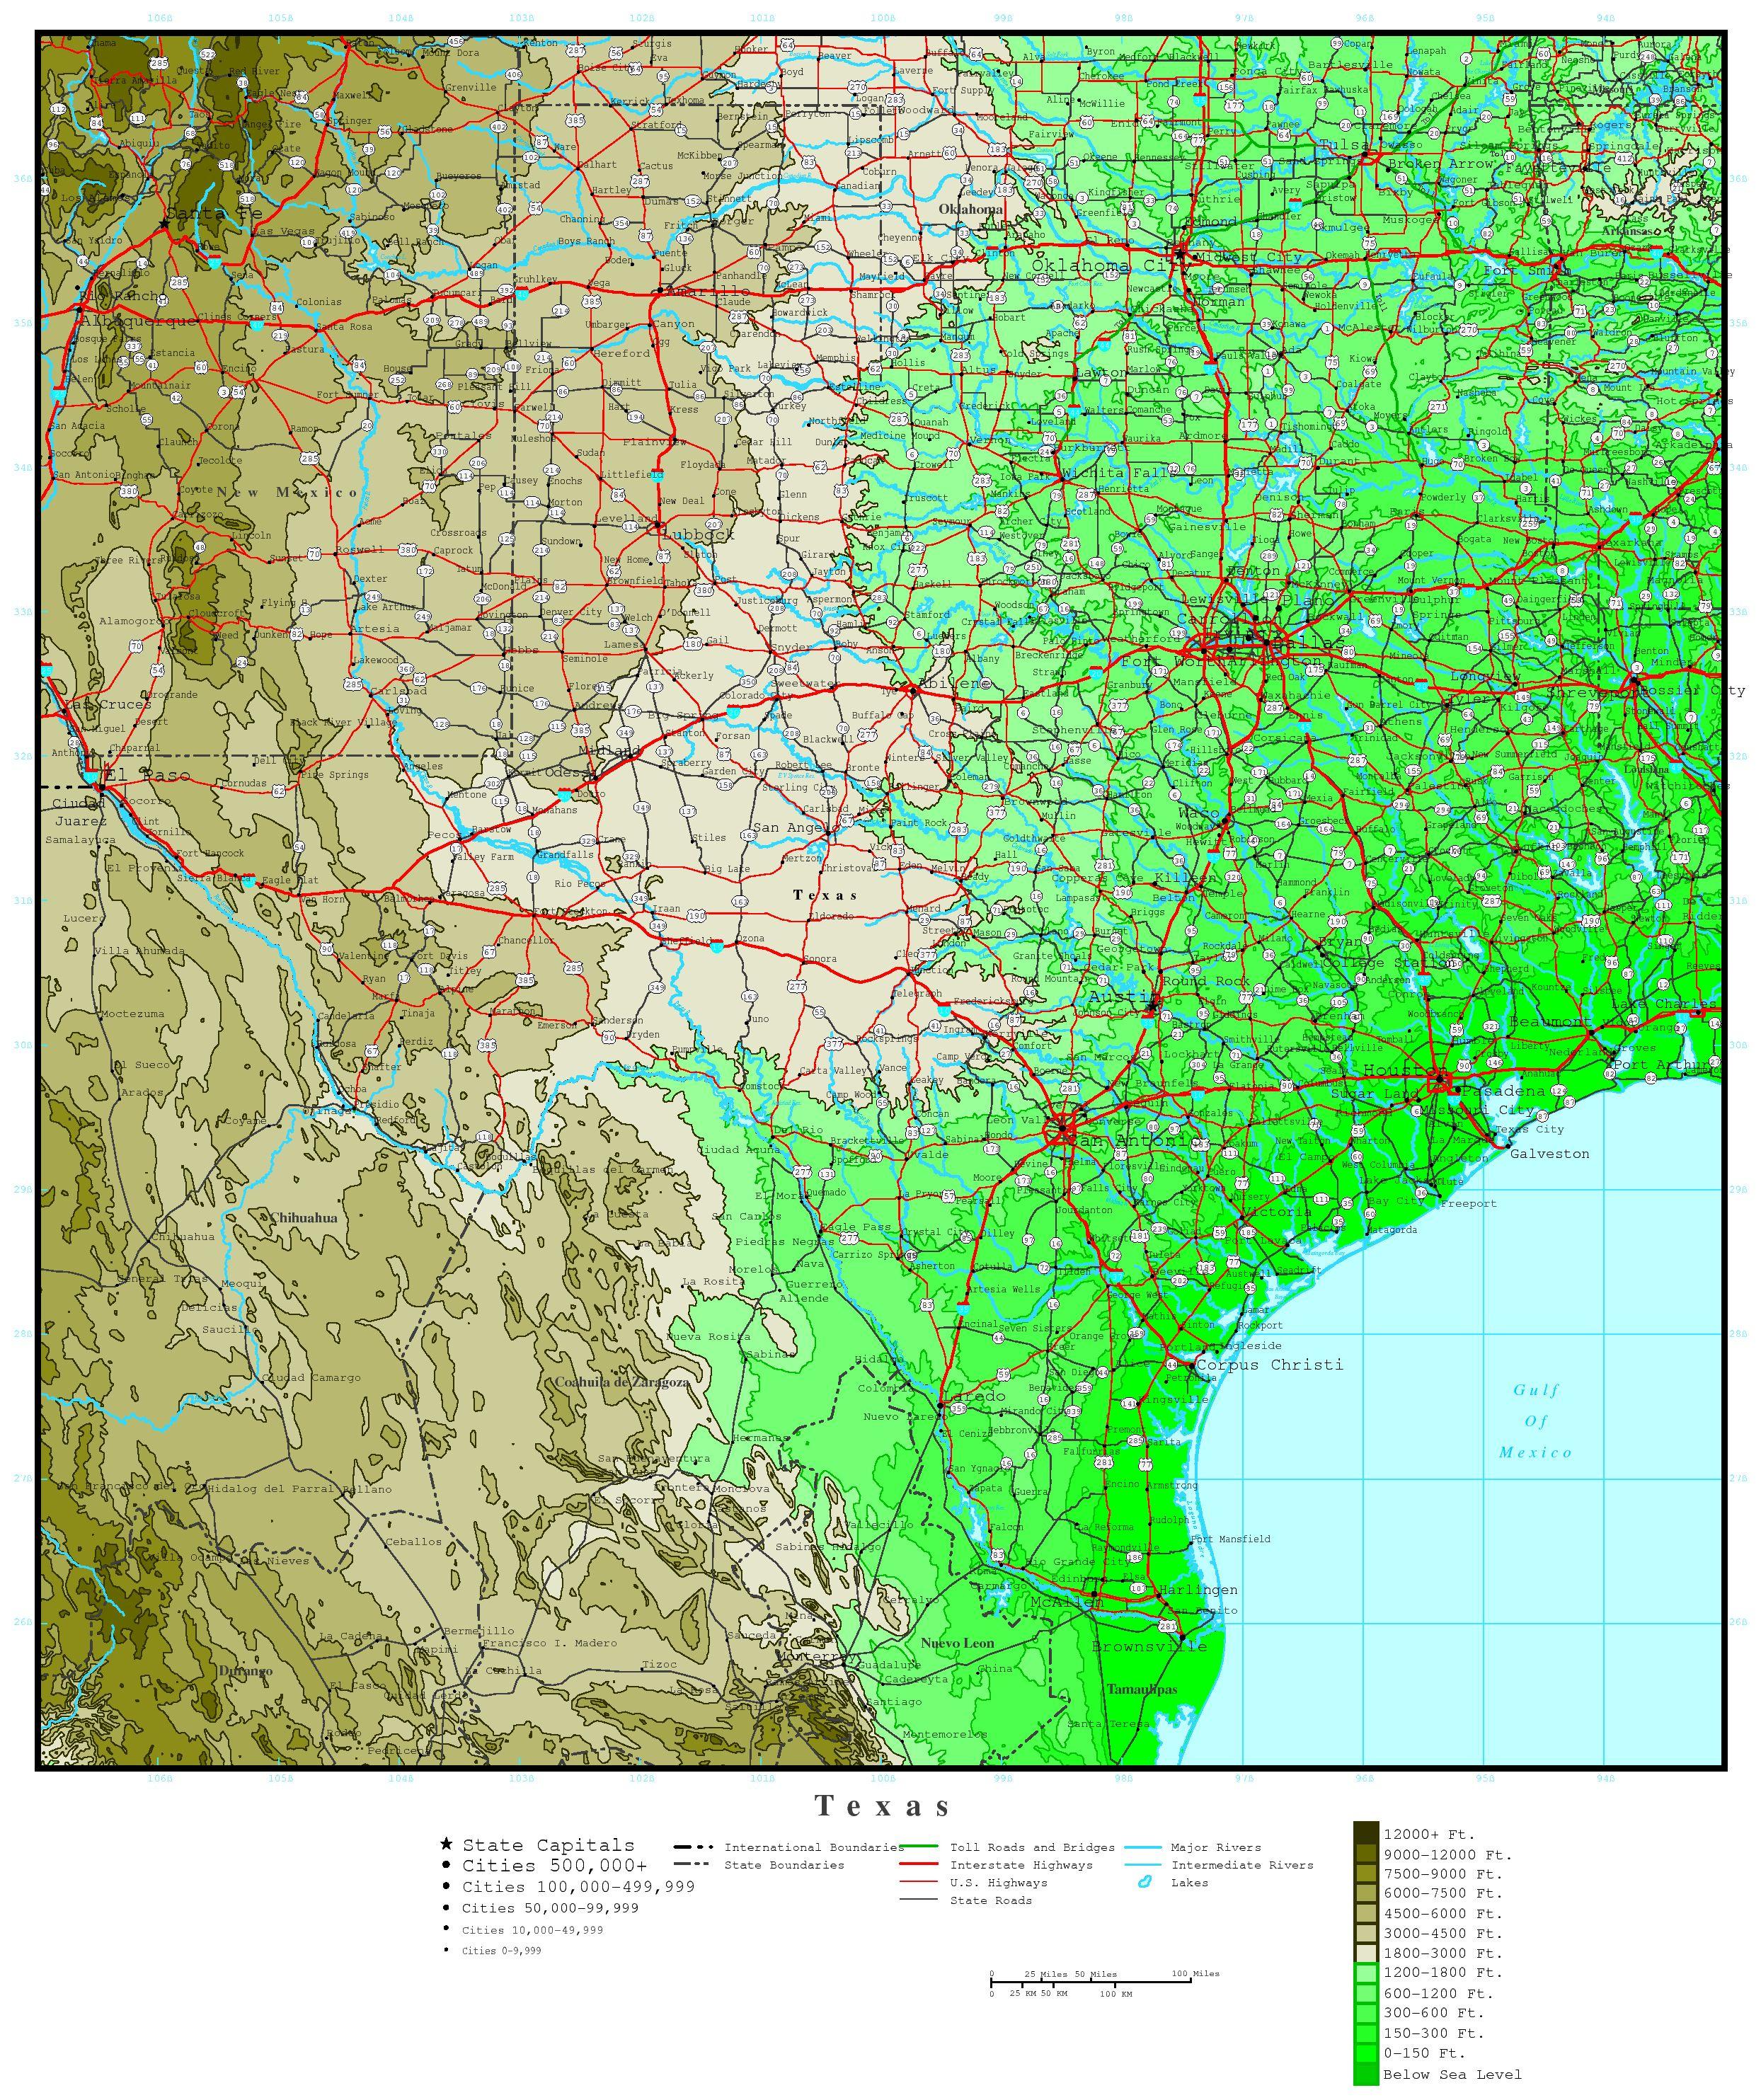 Texas Elevation Map - Austin Texas Elevation Map